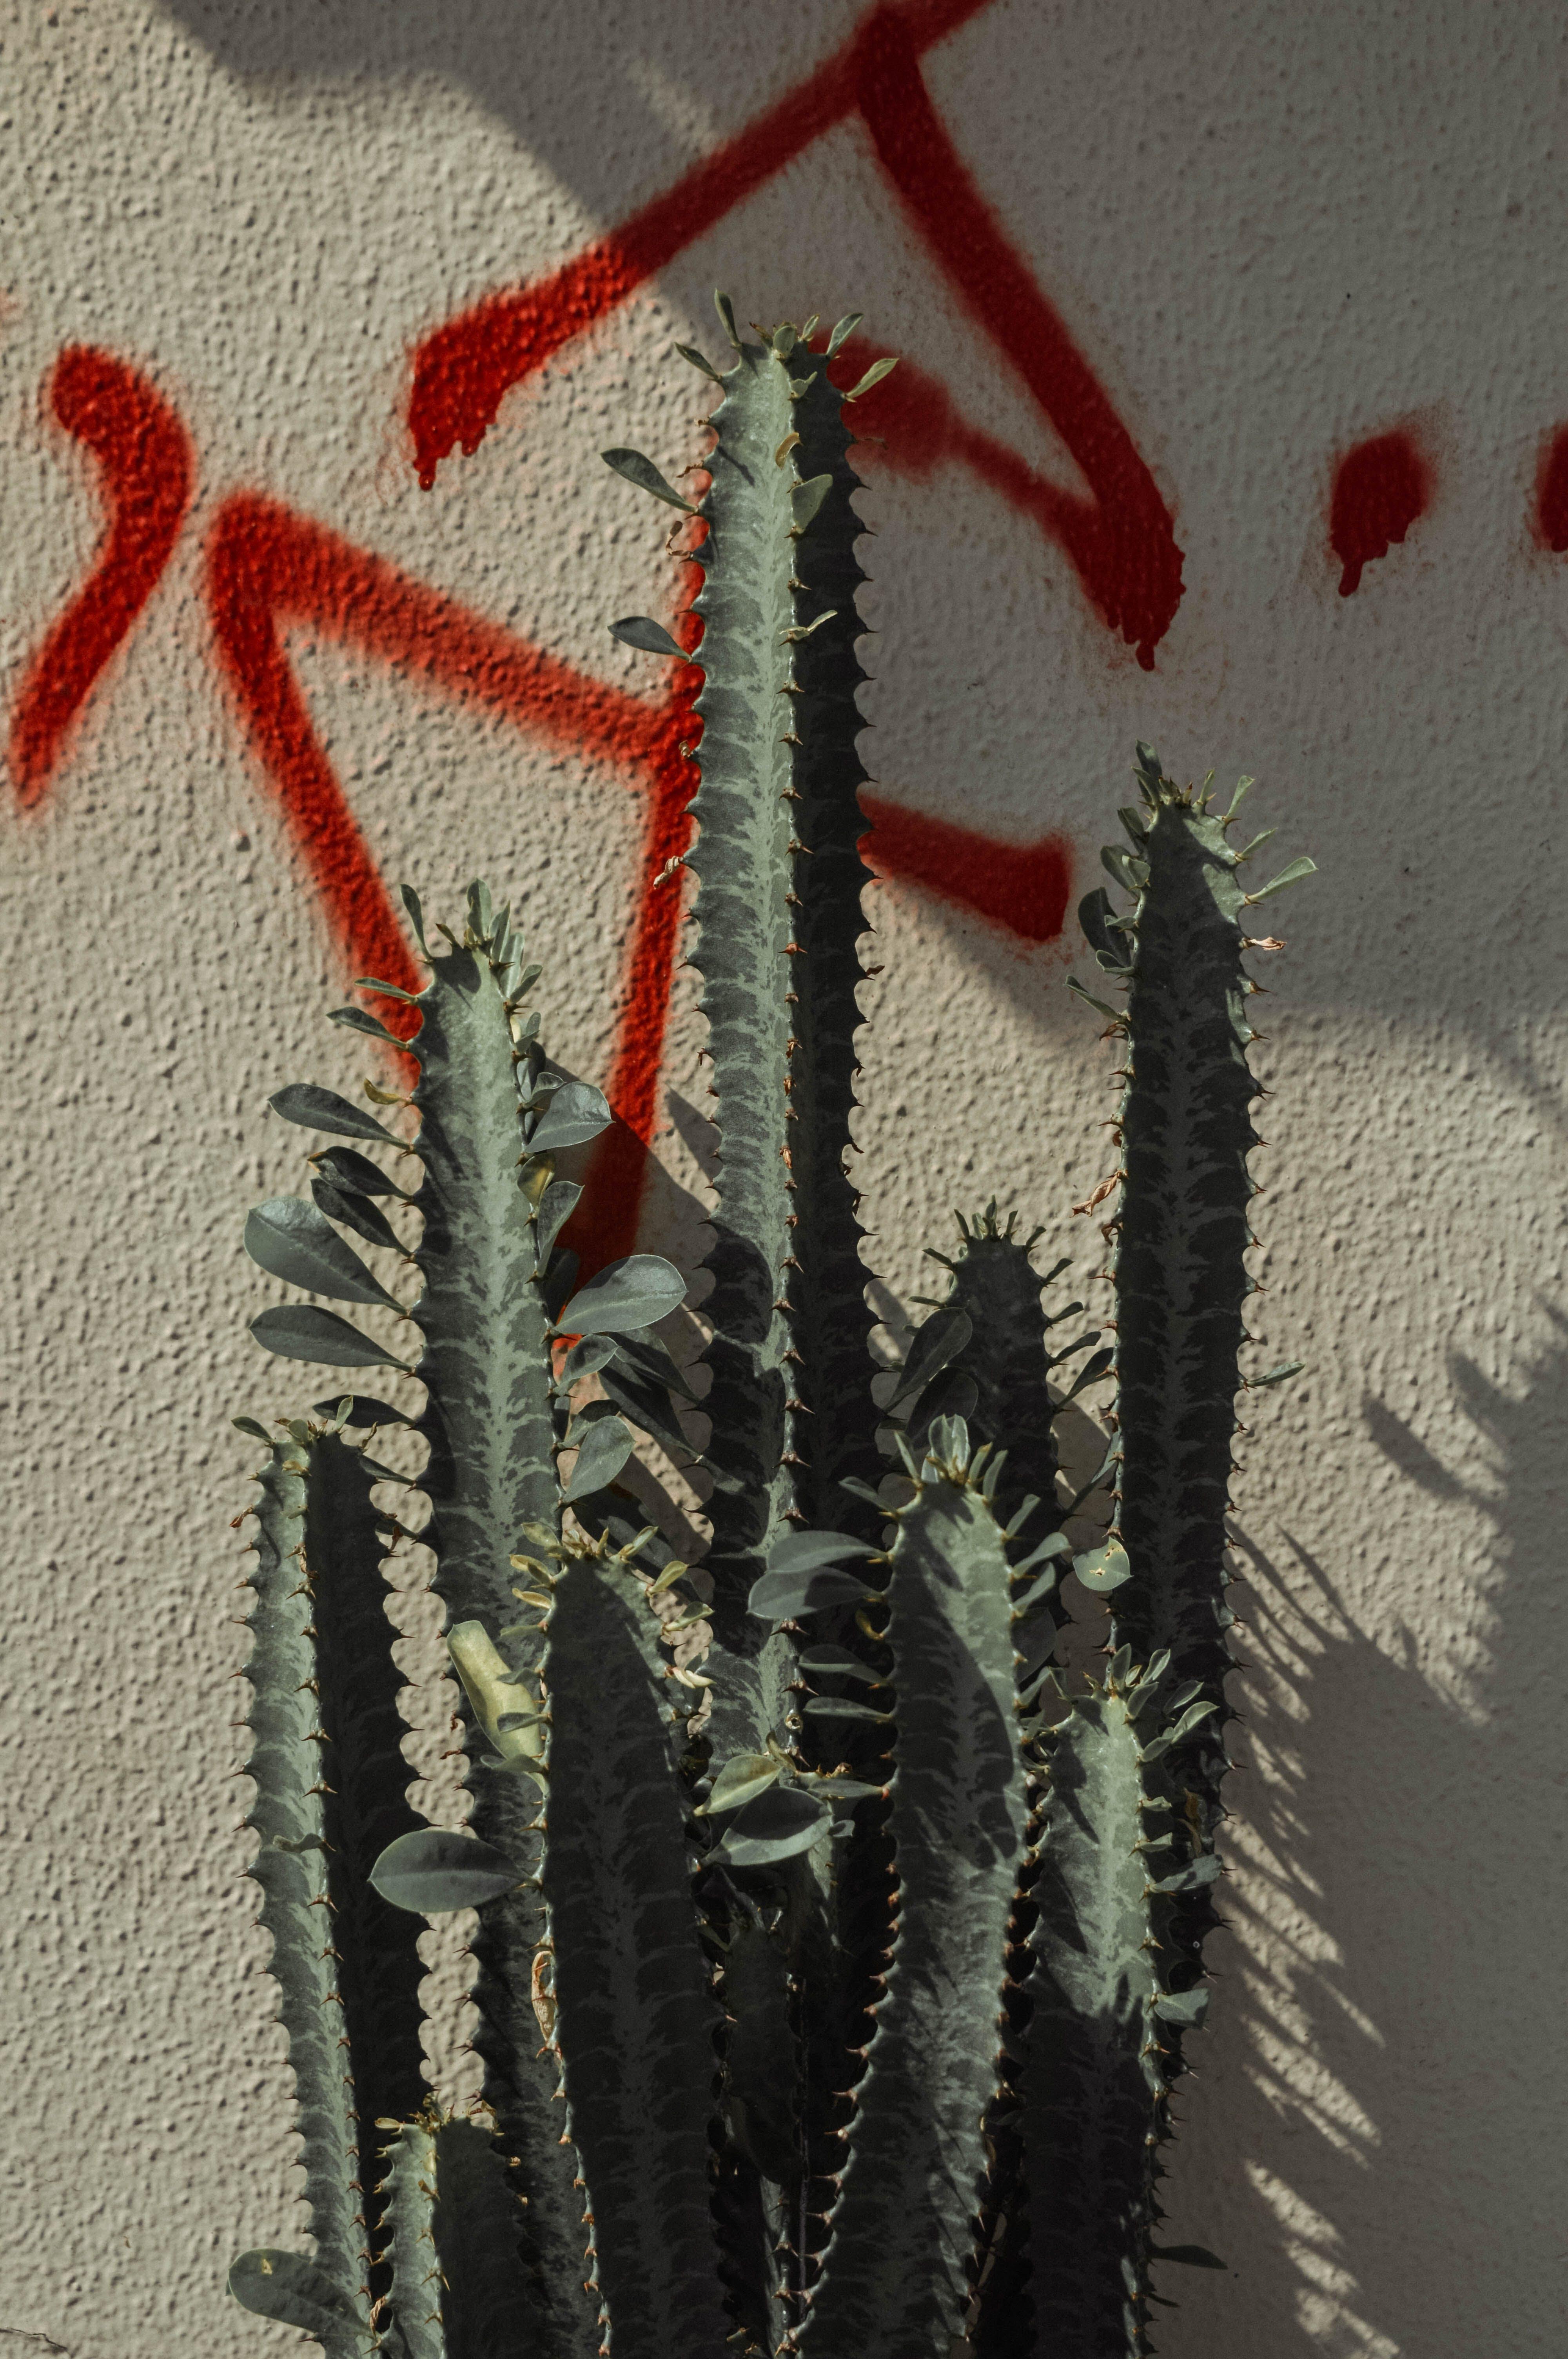 Gratis stockfoto met cactus, cactusplant, cactussen, fabriek